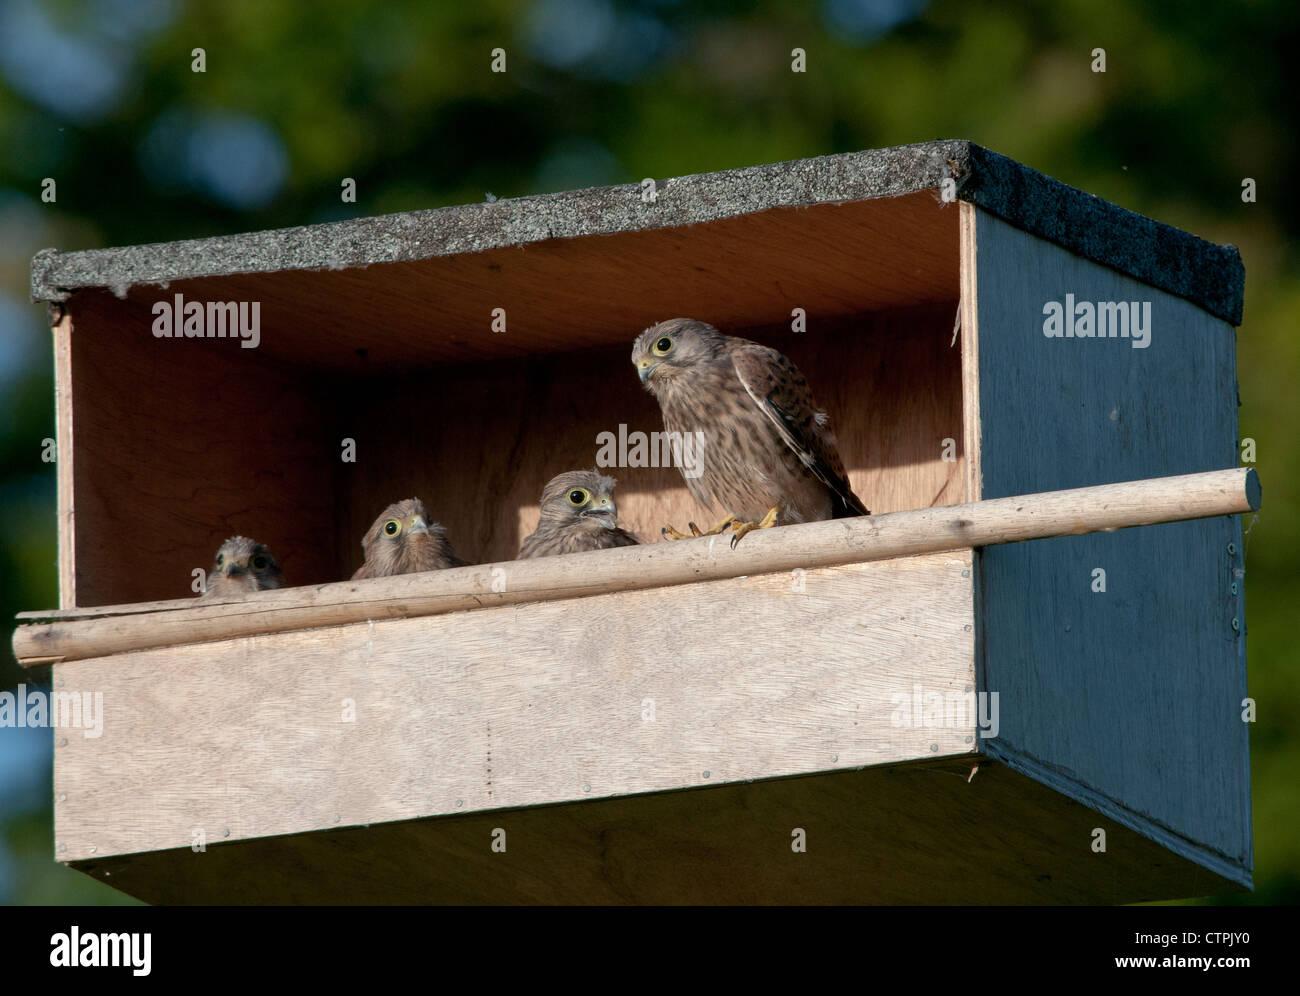 Juvenile Kestrels (Falco tinnunculus) - Stock Image